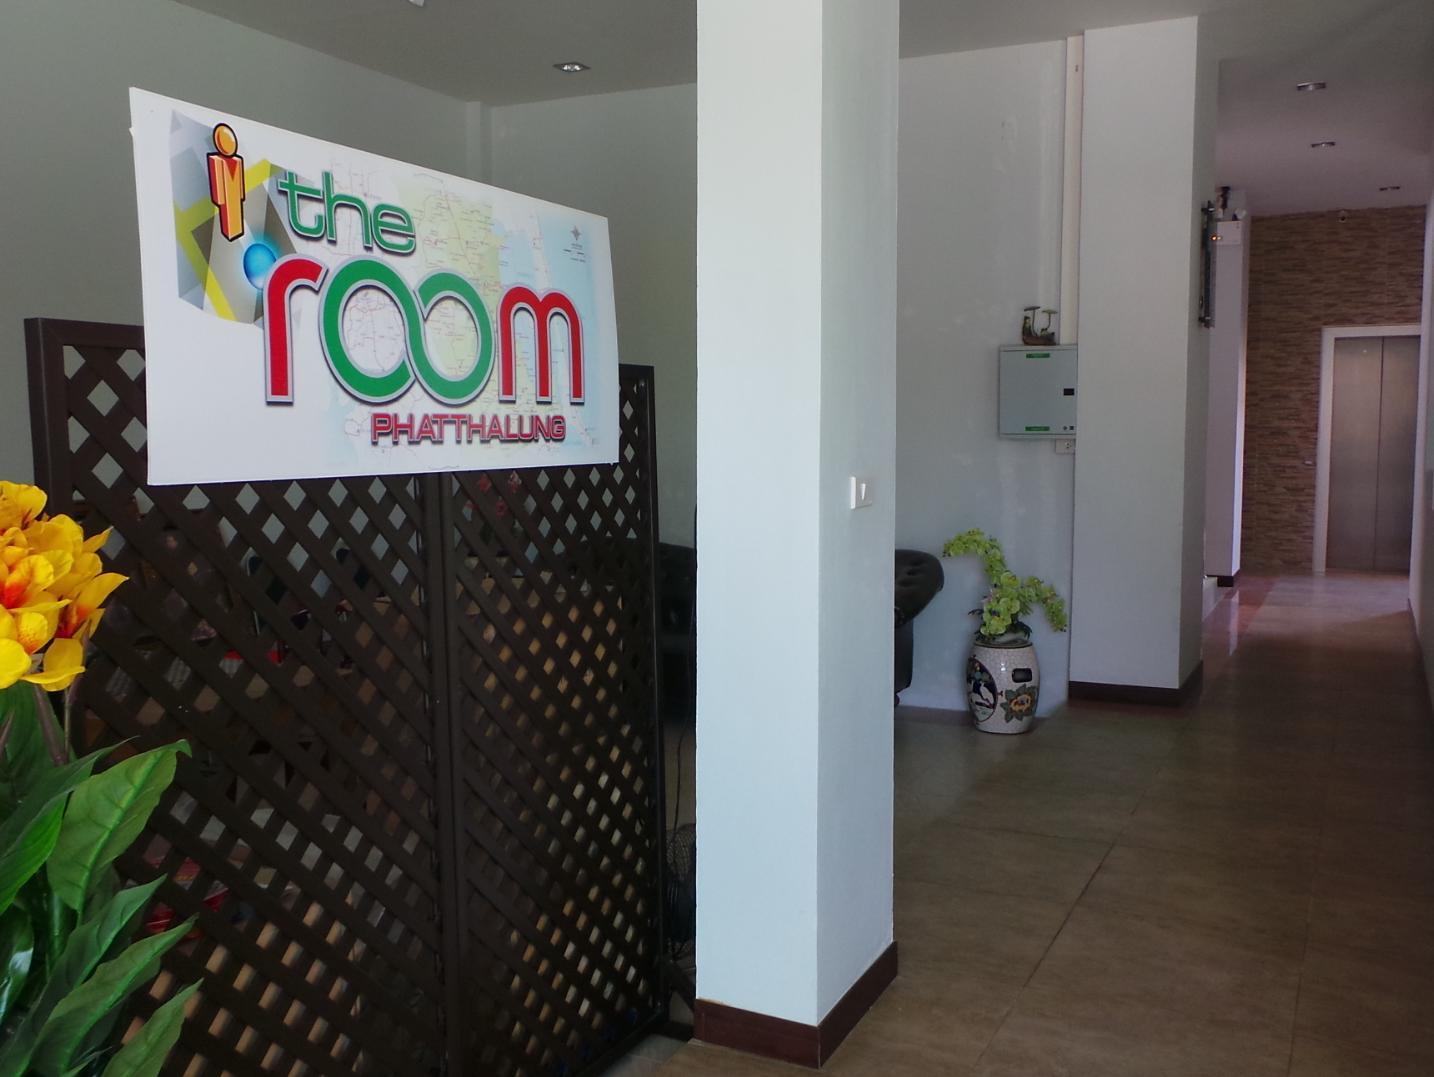 The Room Phatthalung